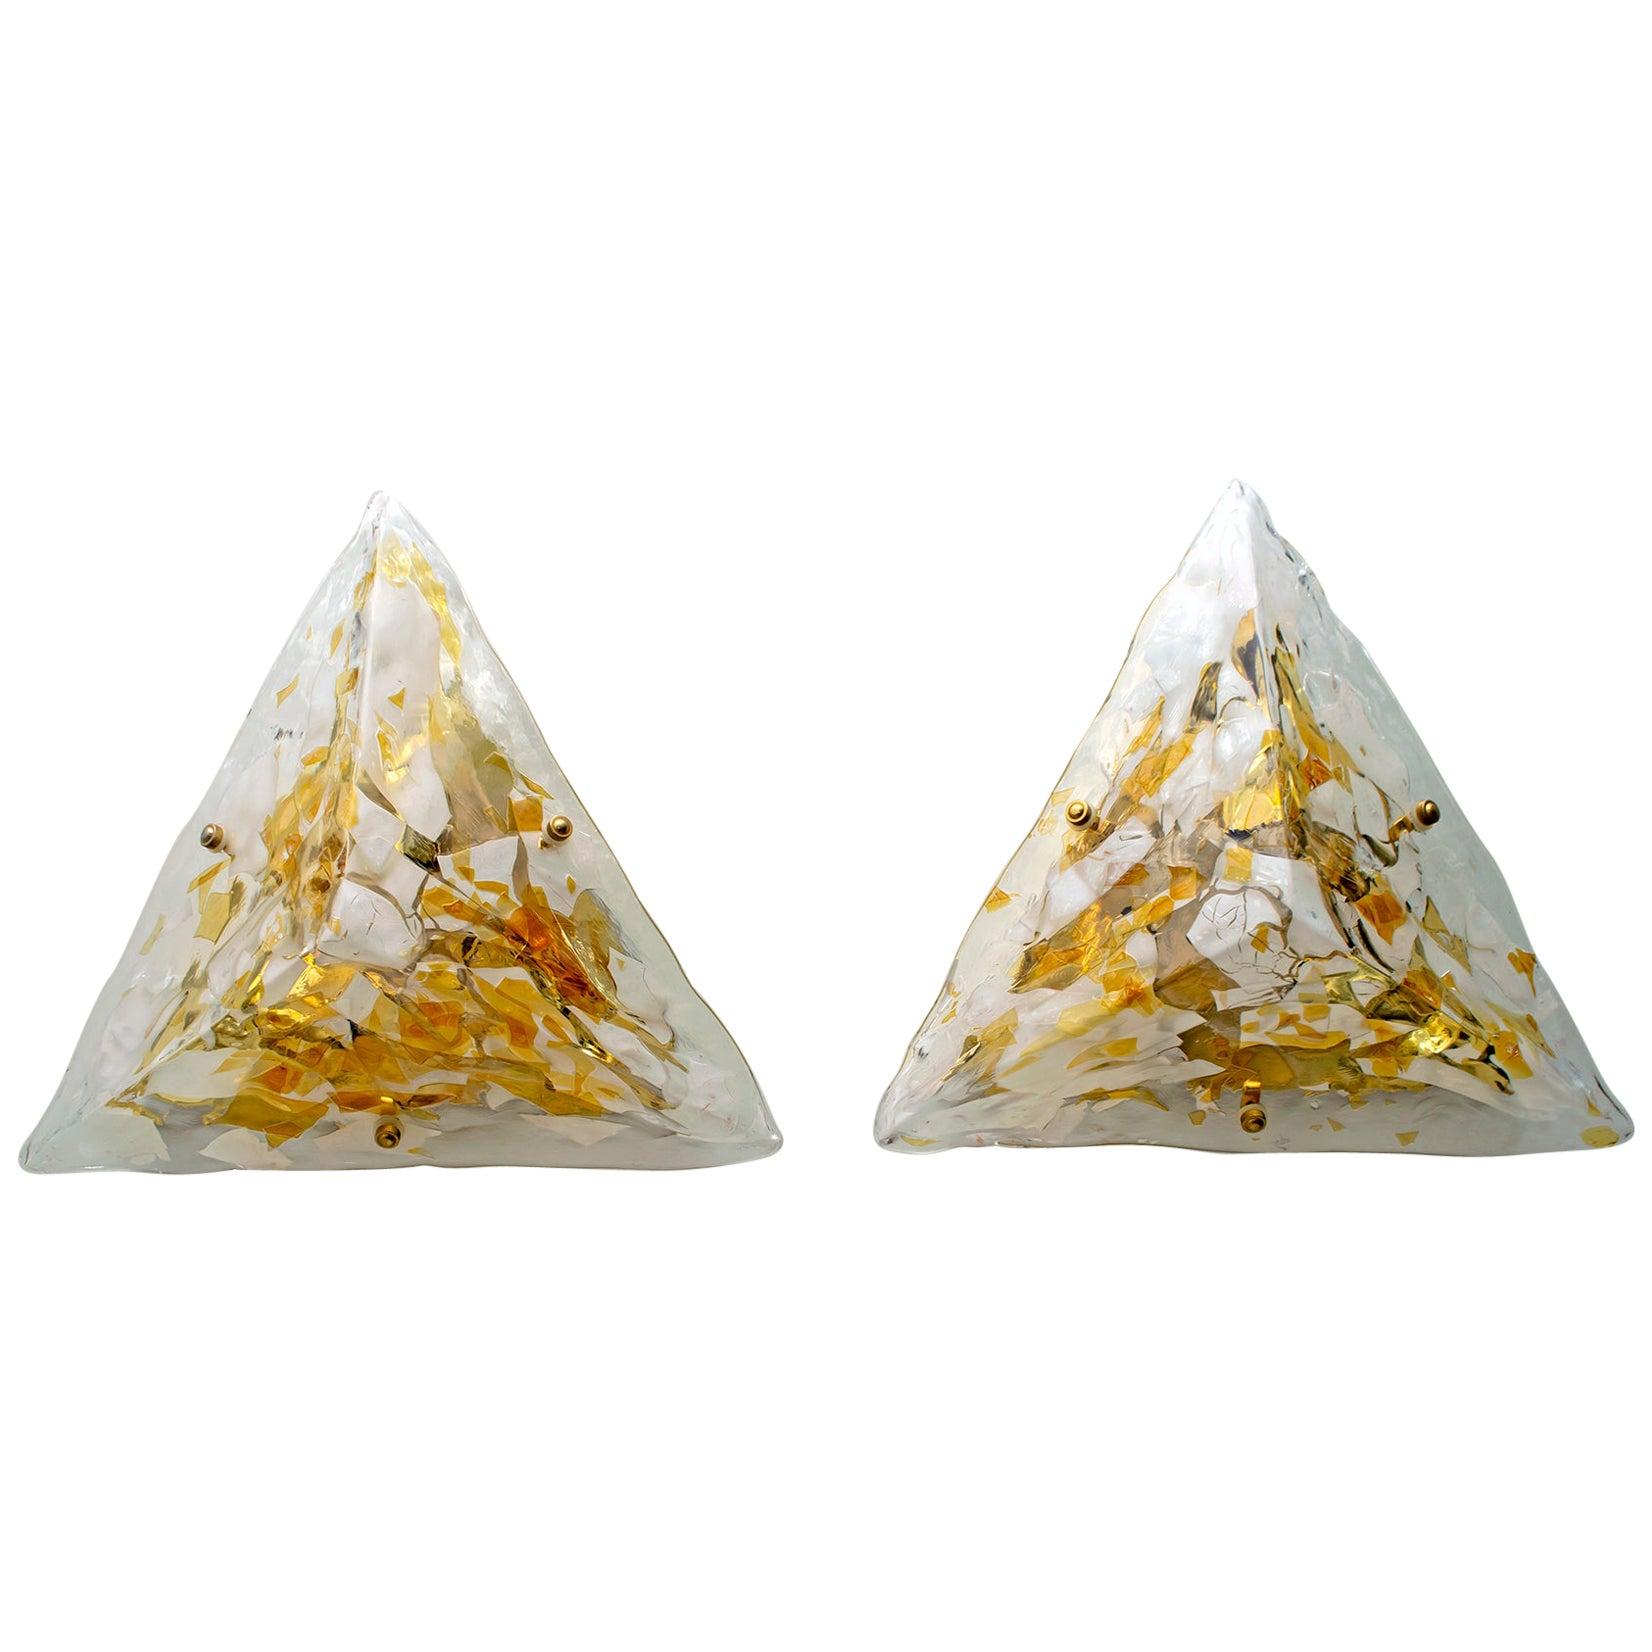 Pair of Mid-Century Modern Italian Murano Glass and Brass Sconces, 1980s